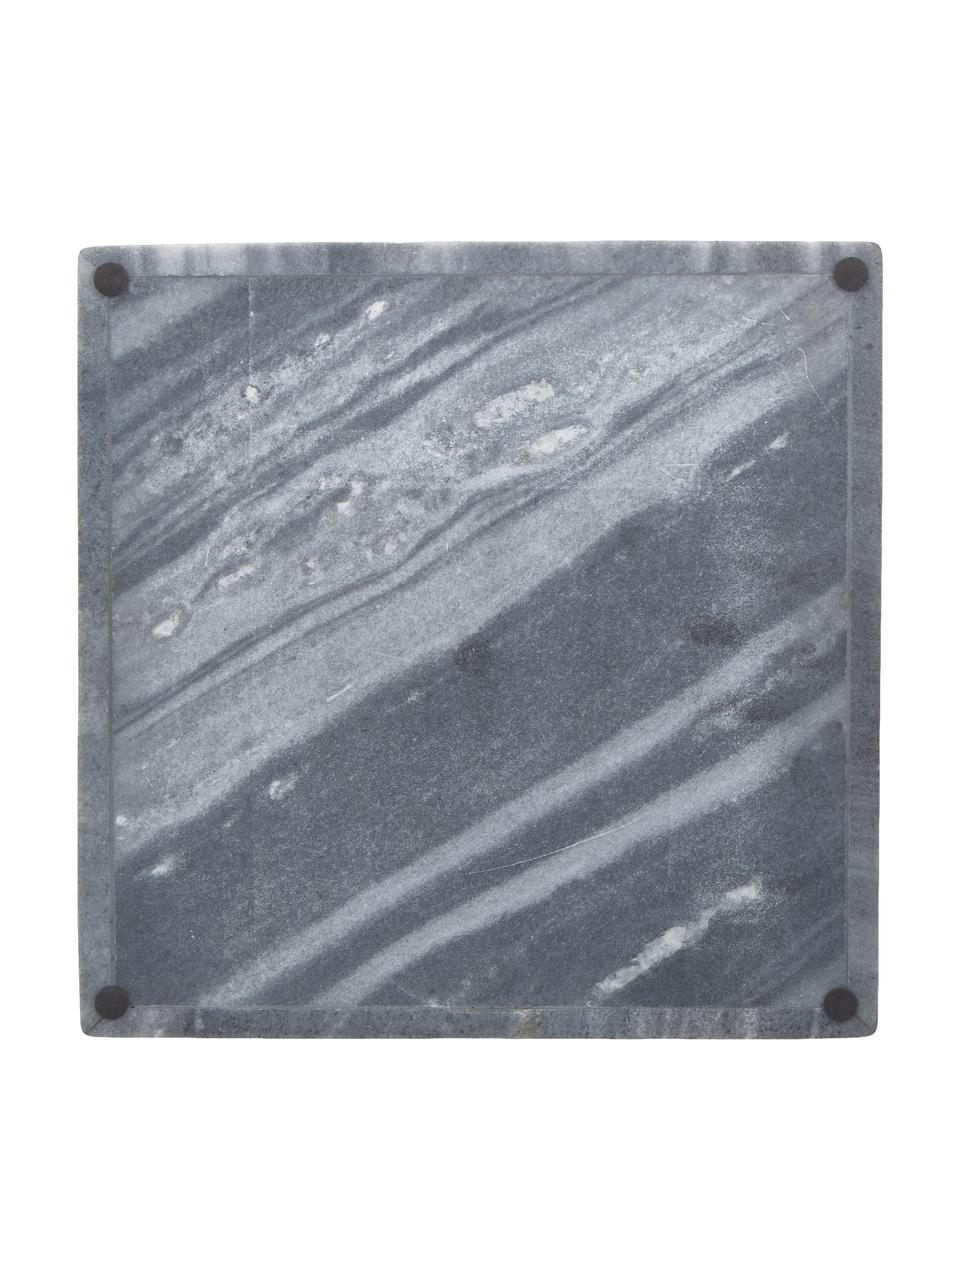 Deko-Marmor-Tablett Sienna in Grau, Marmor, Grau, 30 x 4 cm